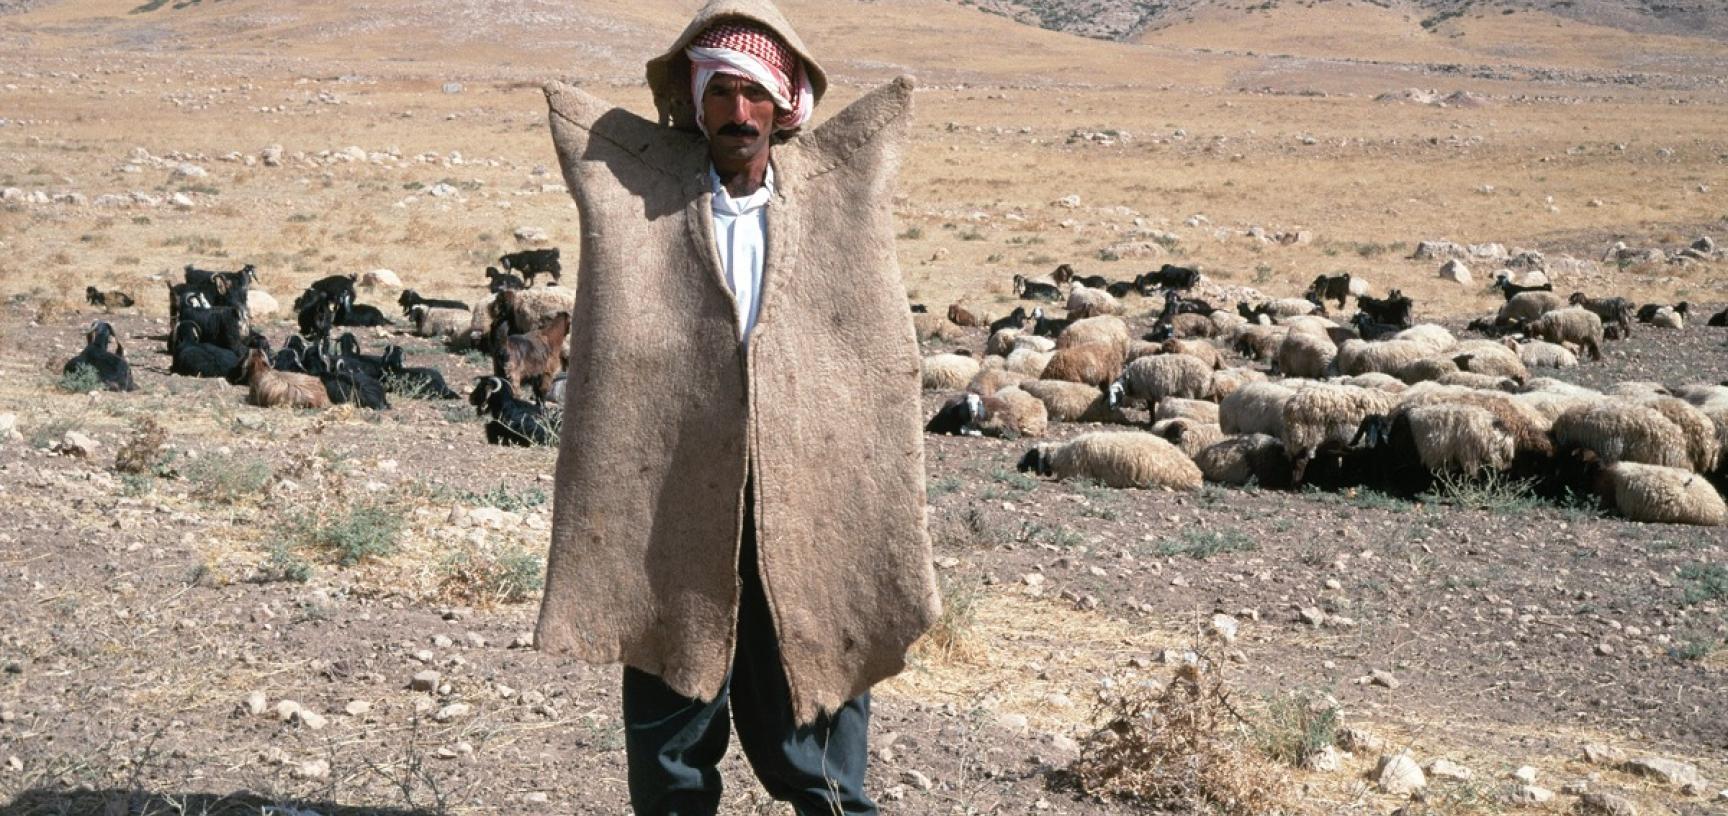 Portrait of a Kurdish shepherd wearing a wide-shouldered felt coat (kepenek). Photograph by Sheila Paine. Iraq. 1992. (Copyright Pitt Rivers Museum, University of Oxford. Accession Number: 2012.4.2106.1)